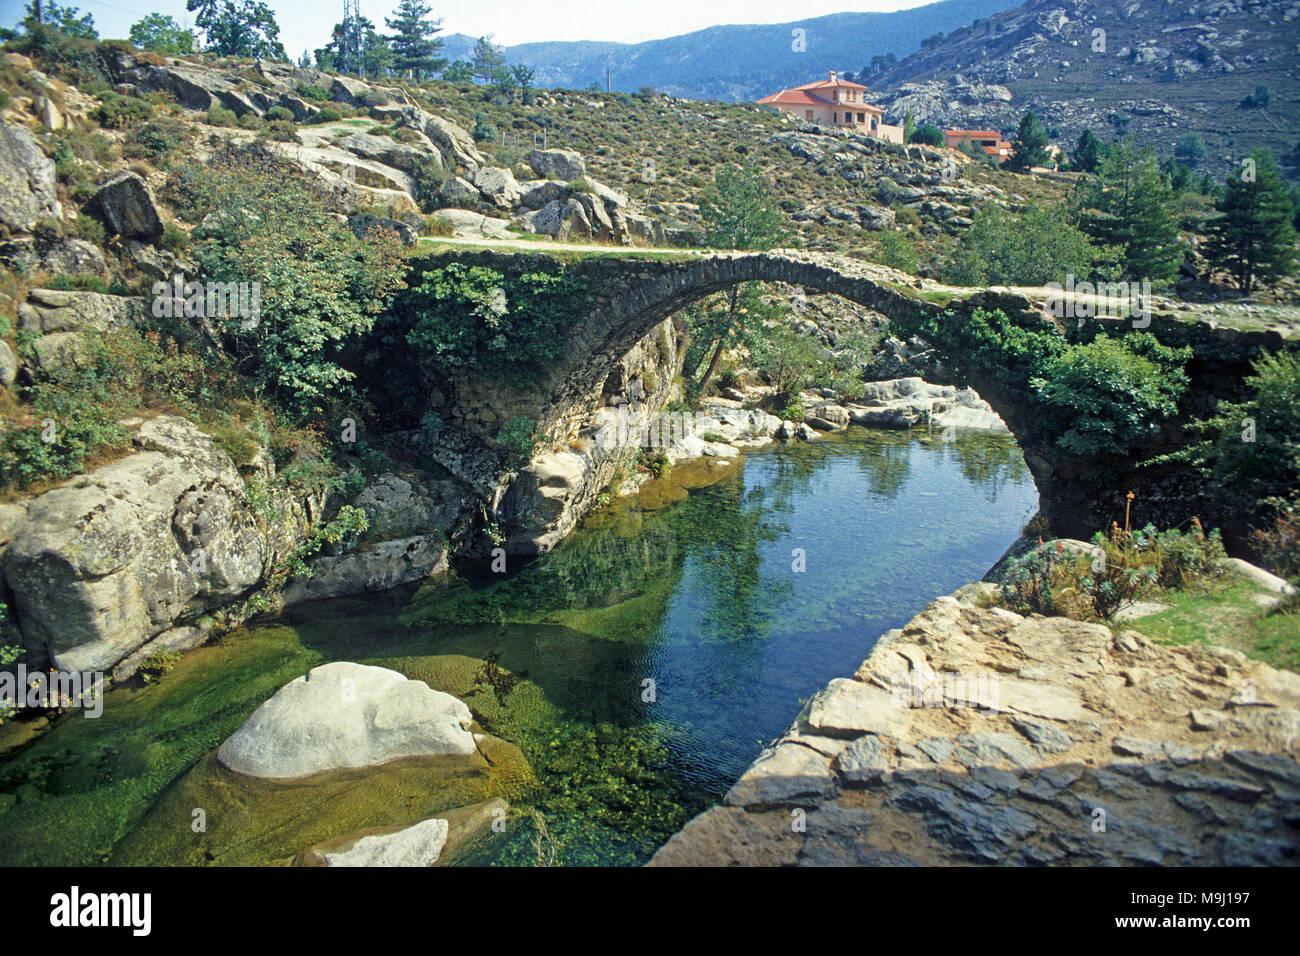 Alte Genueser Steinbrücke in Niolu Tal, Calacuccia, Korsika, Frankreich, Mittelmeer, Europa Stockbild